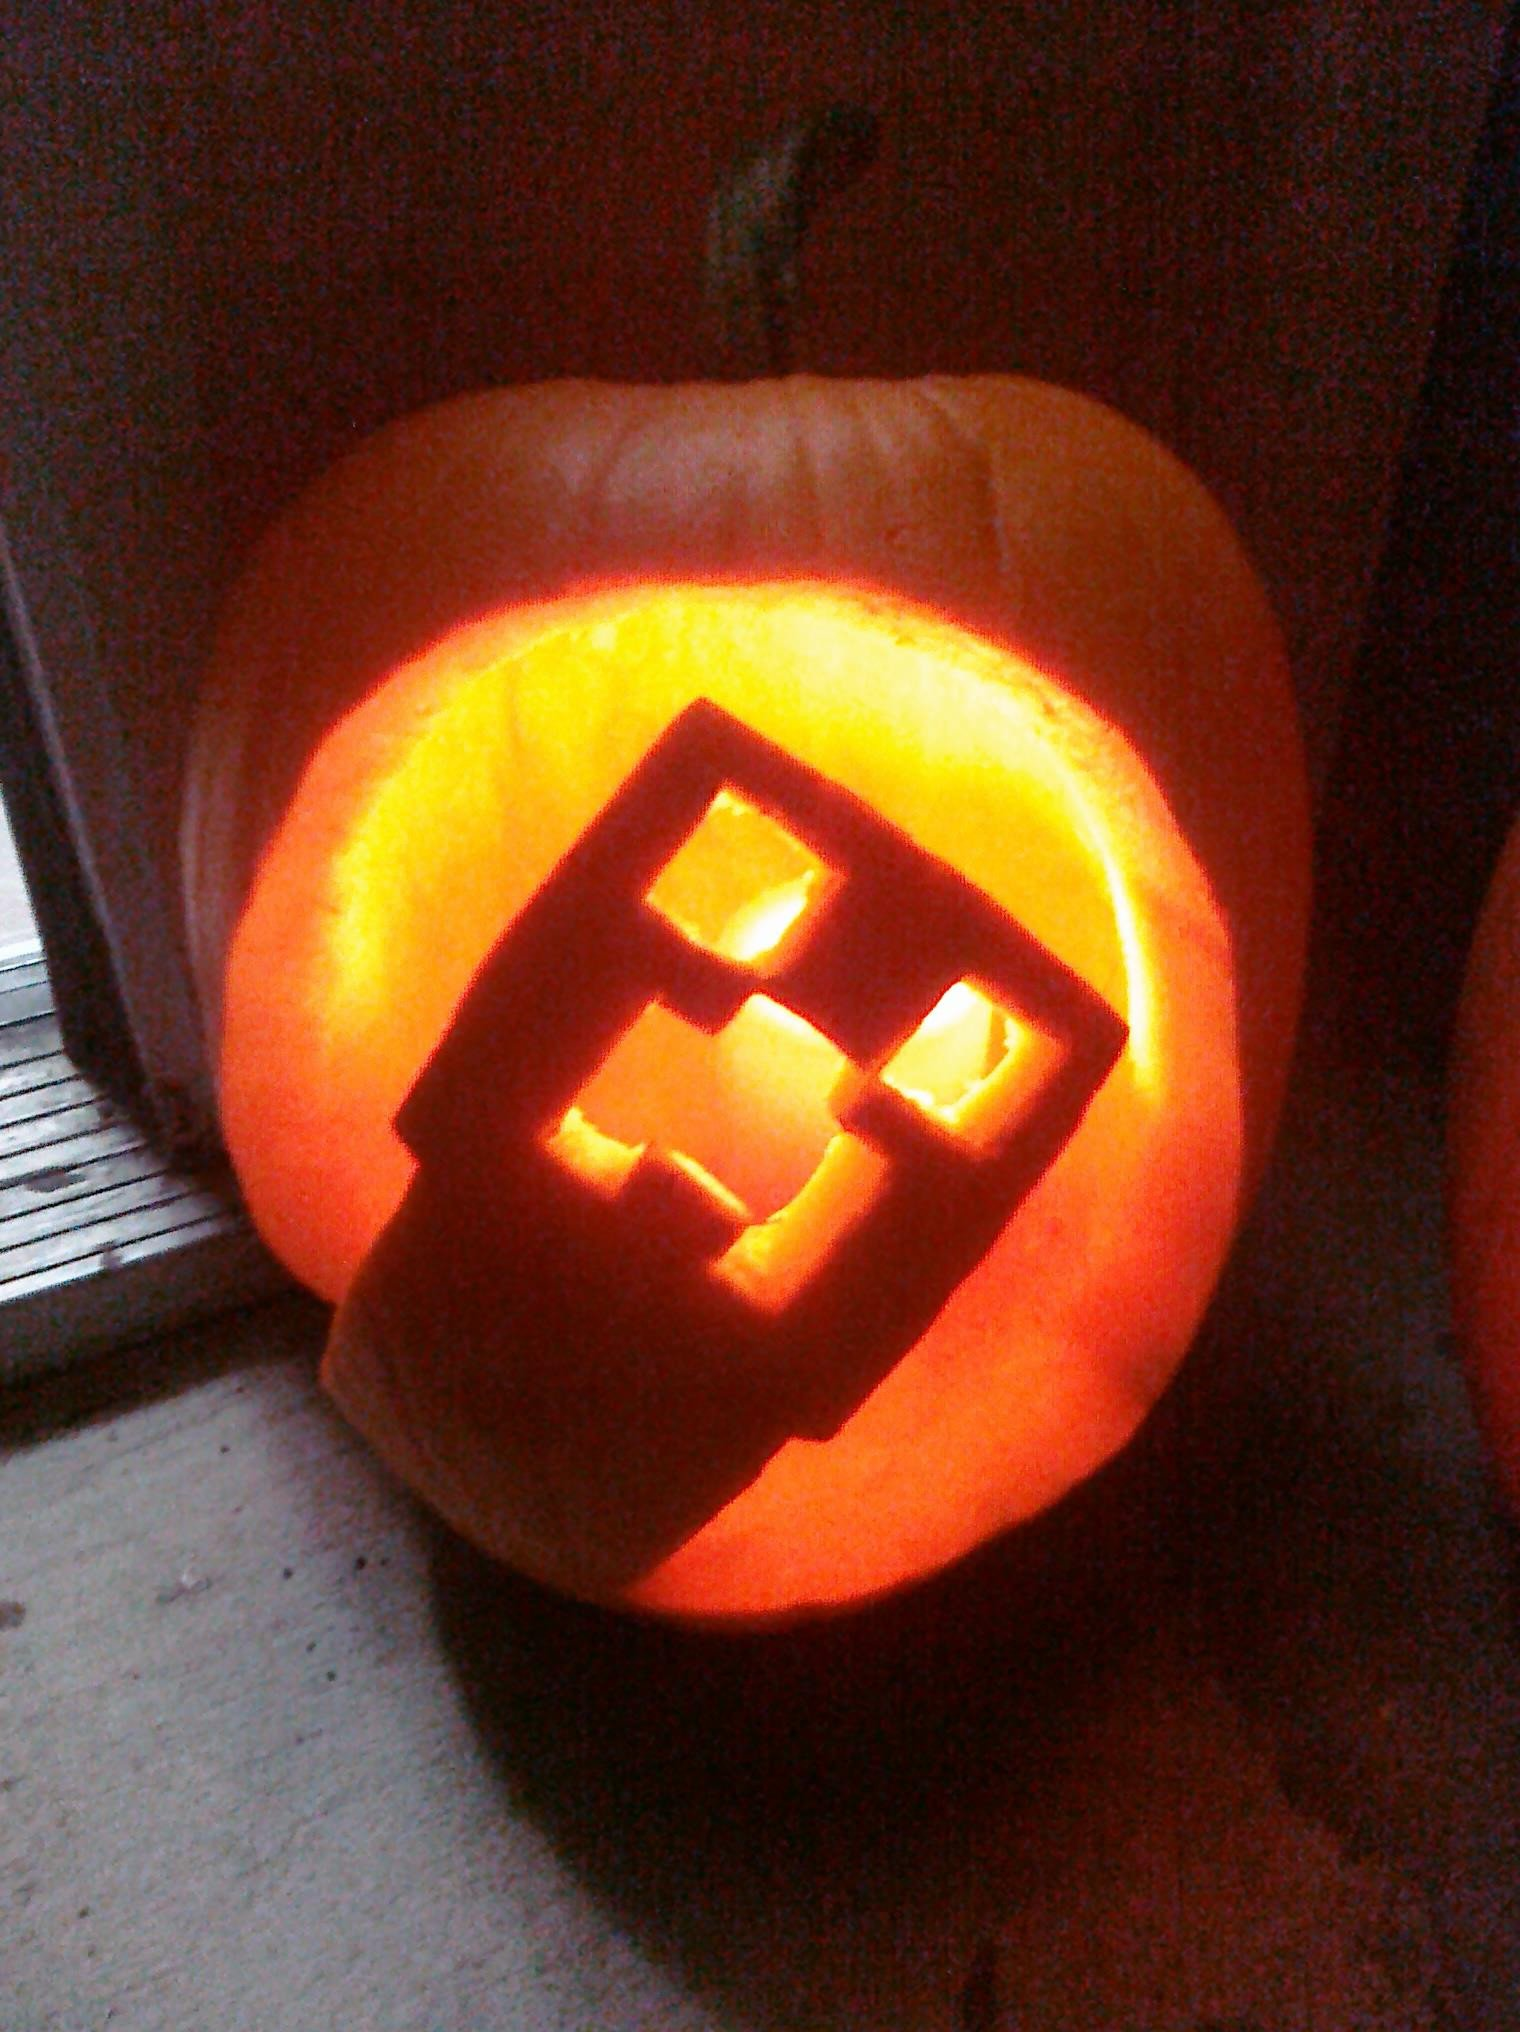 Minecraft Pumpkin Stencils Martian Outpost – Just Another Wordpress Site